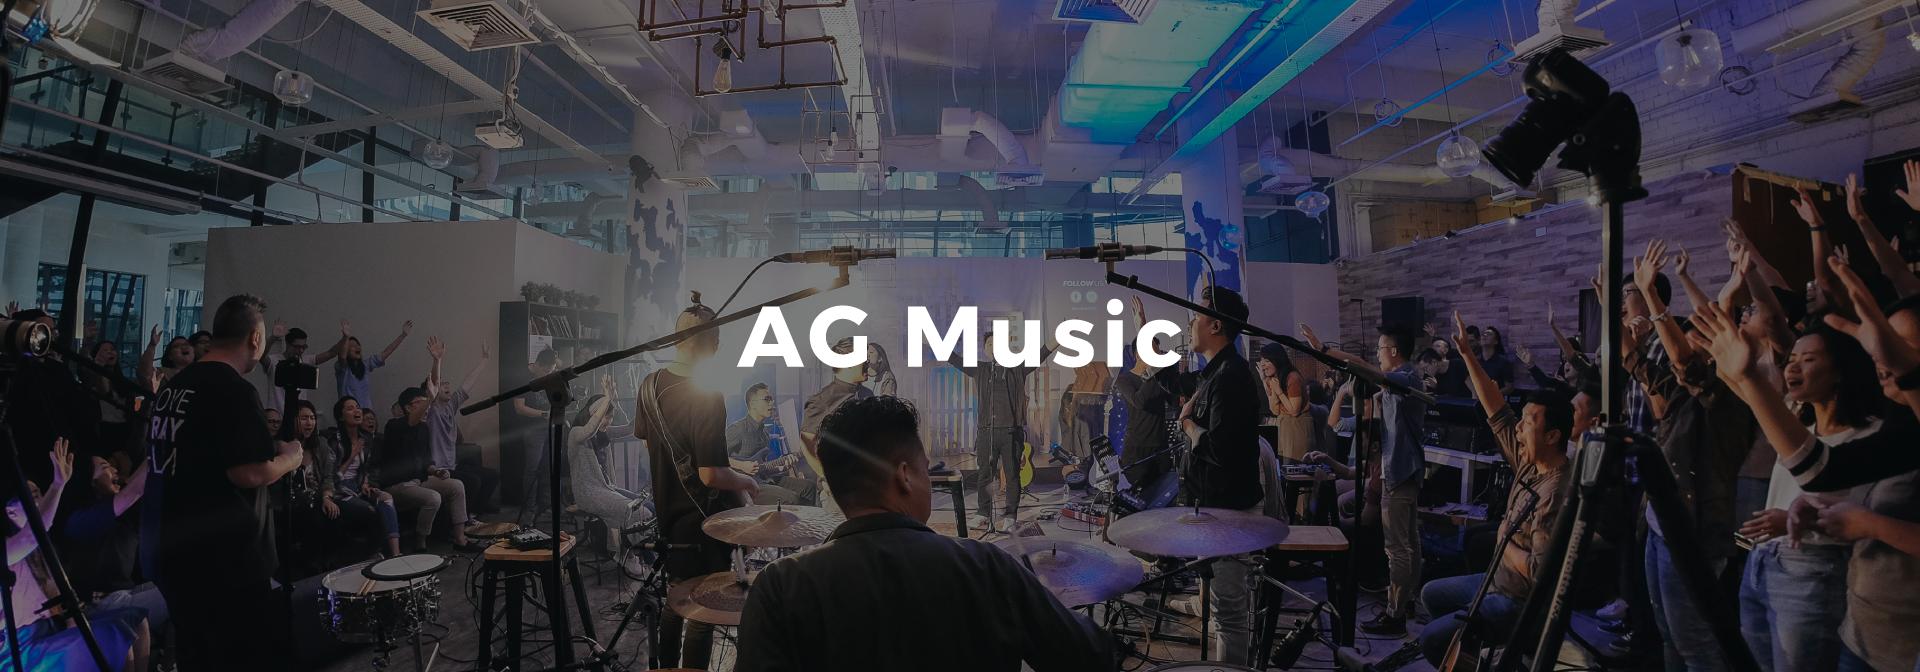 Header-ag-music.png